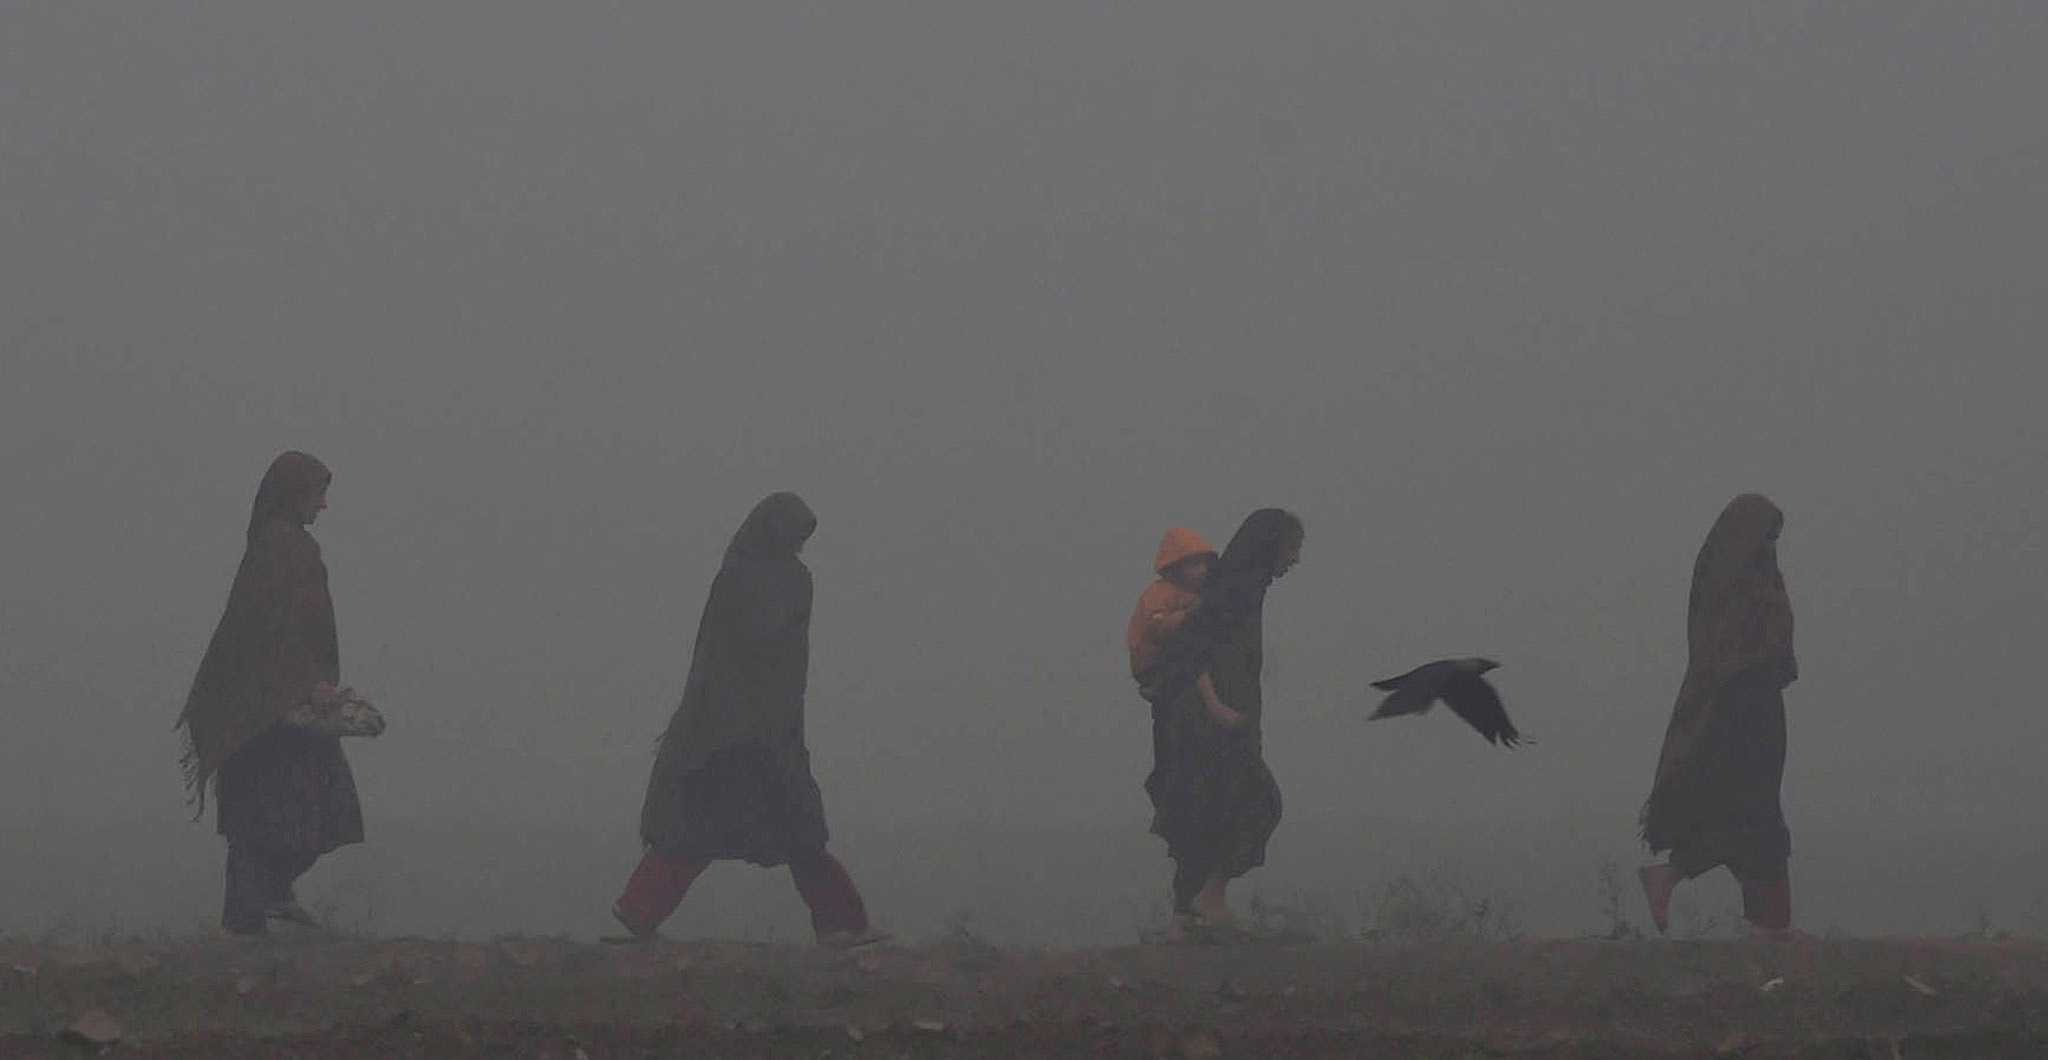 Pakistani women walk along a street on a foggy day in Lahore.